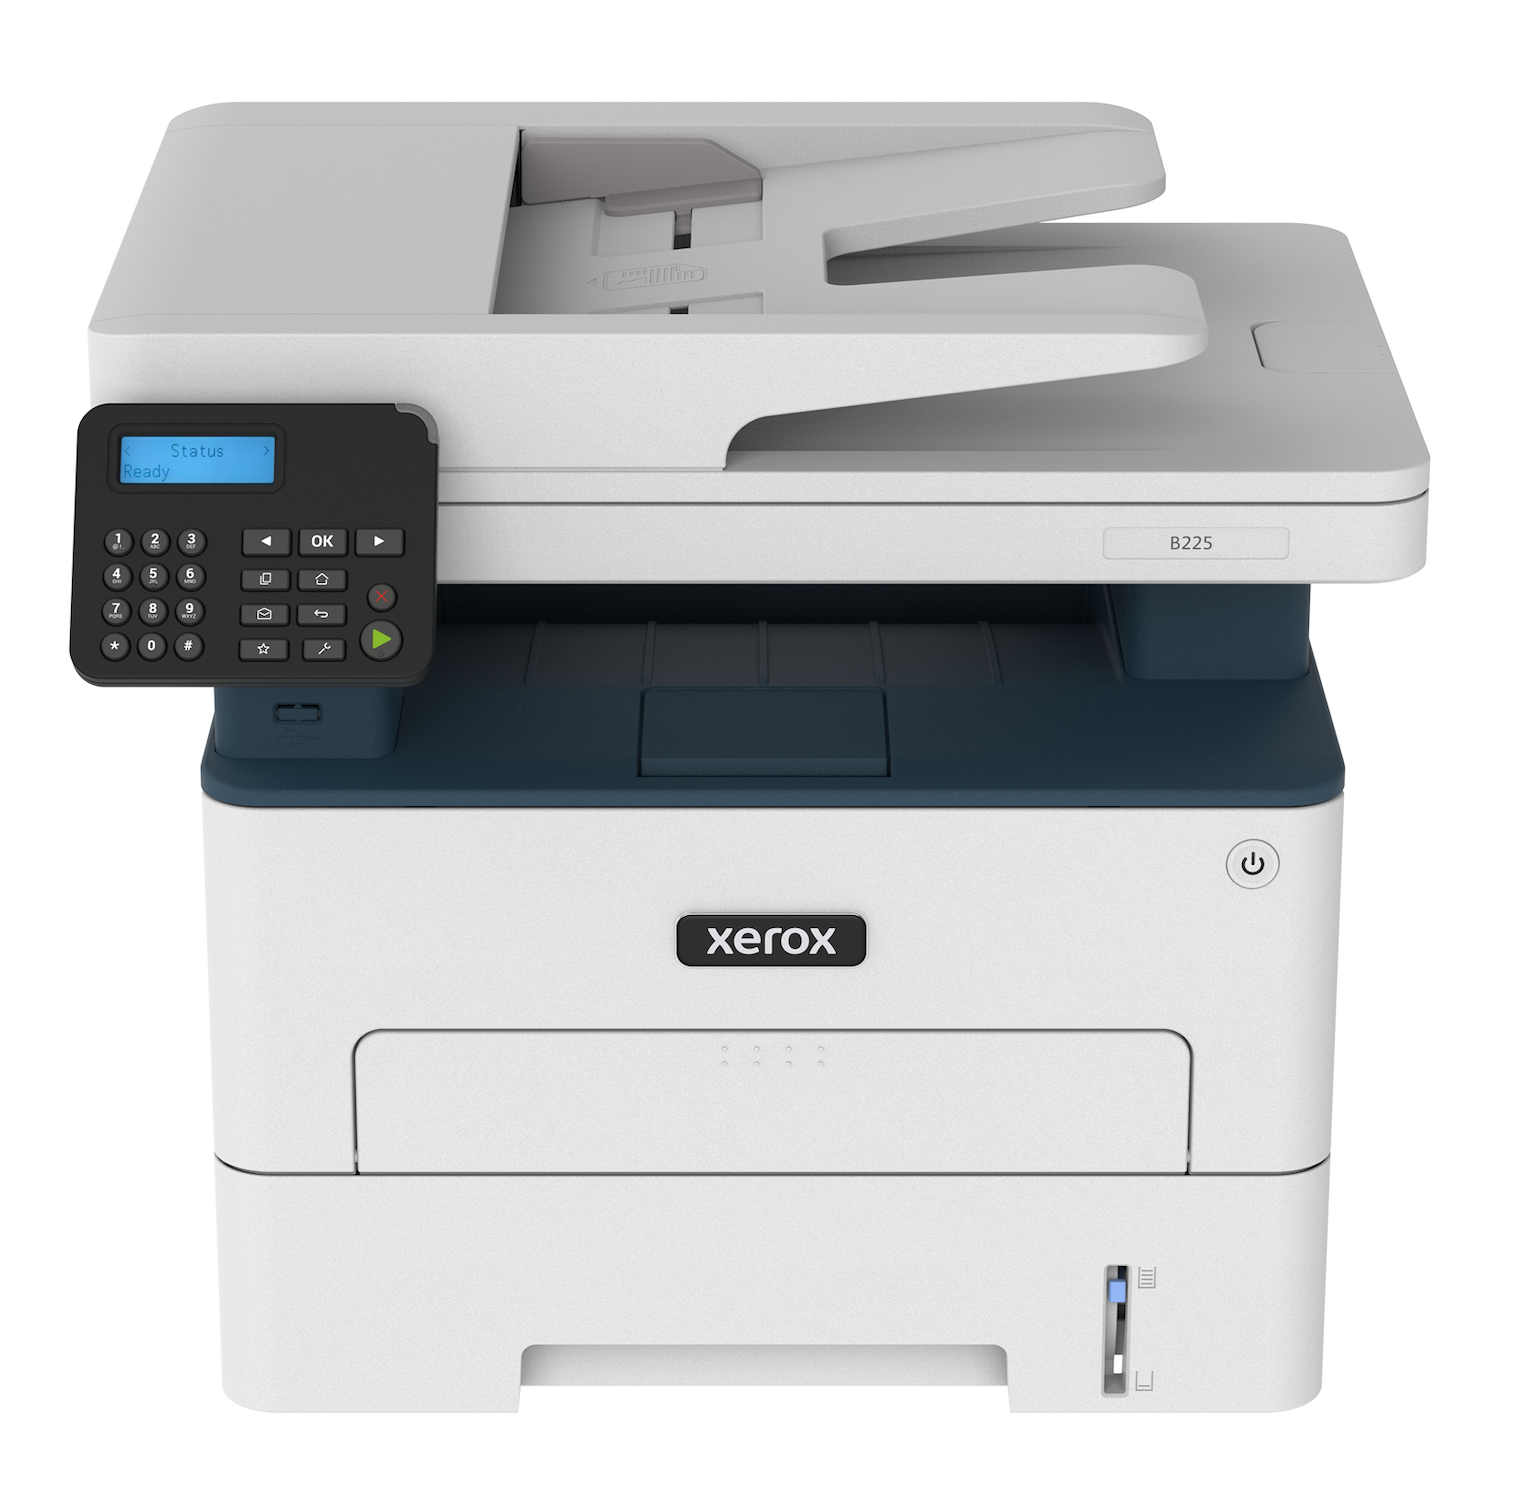 Xerox B225 Multifunktionsdrucker